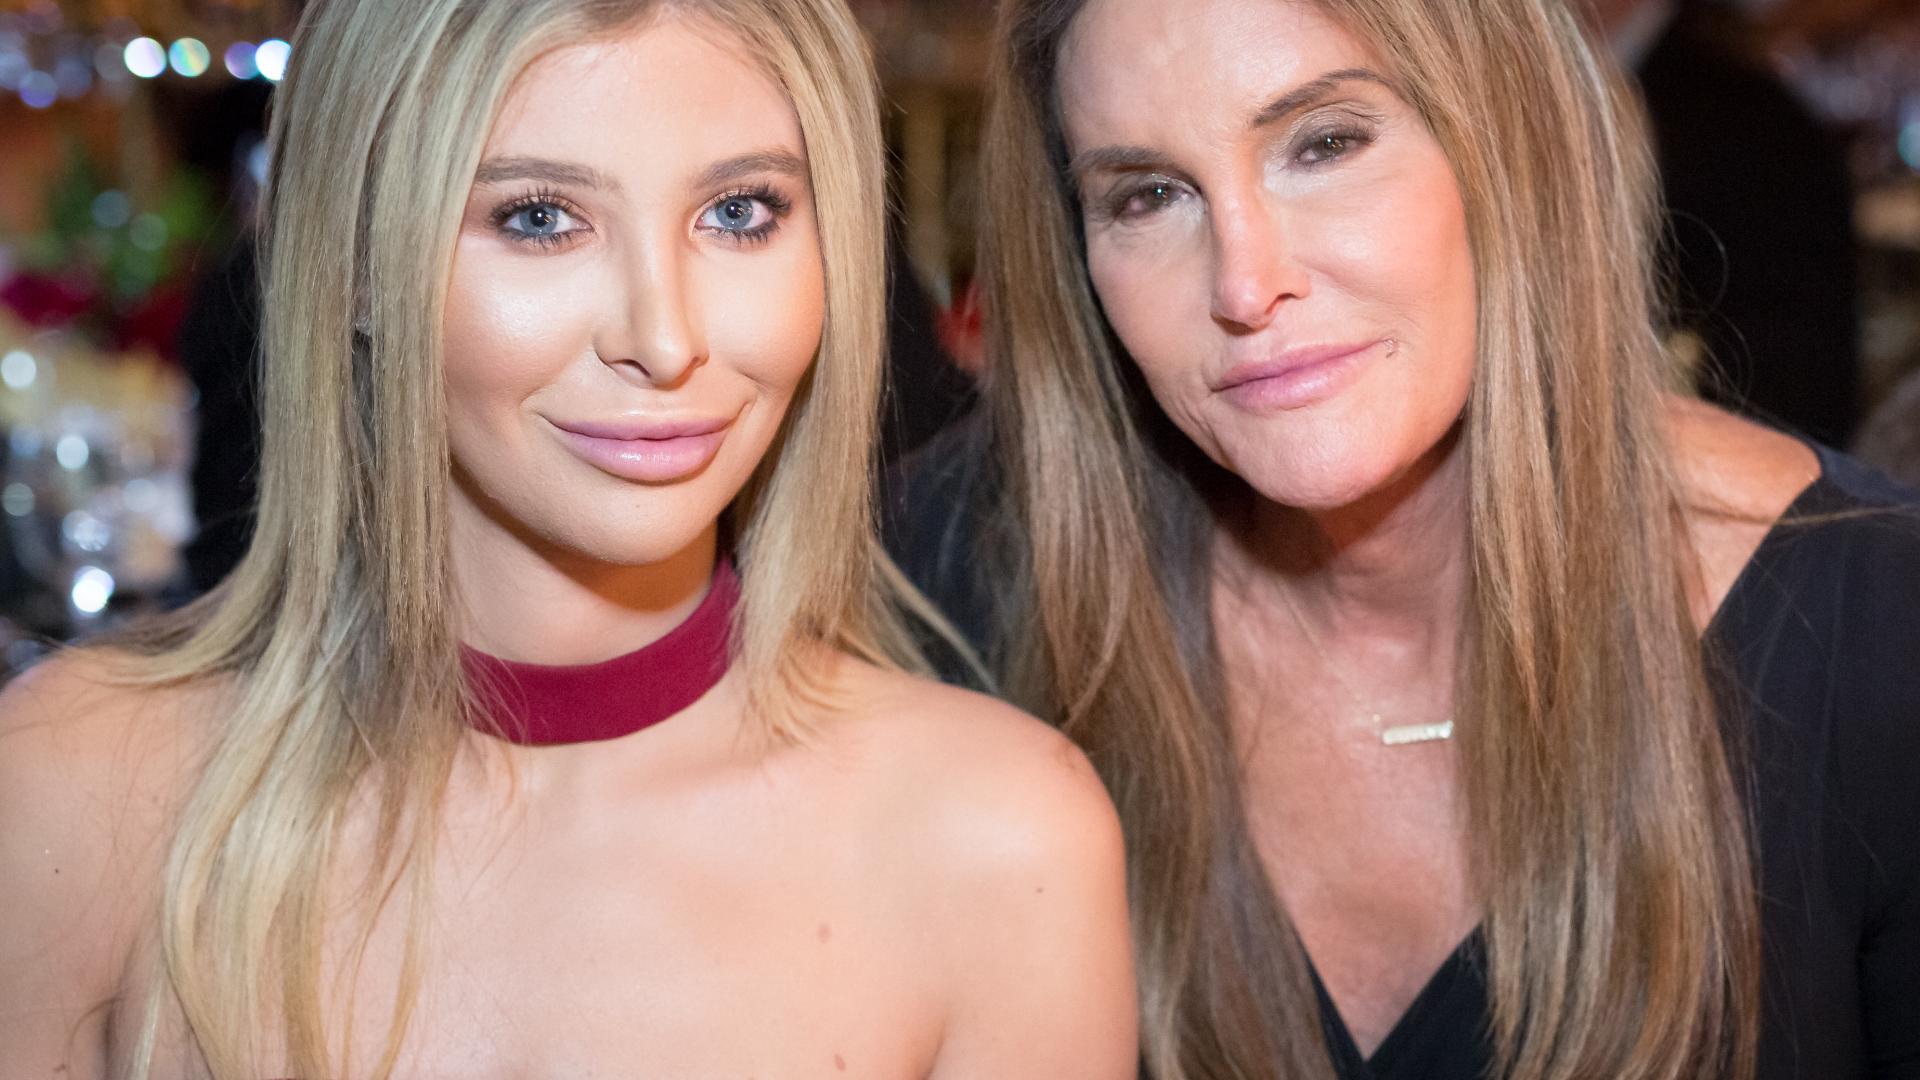 Kim Kardashian Explained Why Nobody Showed Up to Greet Caitlyn Jenner After Her 'I'm a Celeb' Elimination